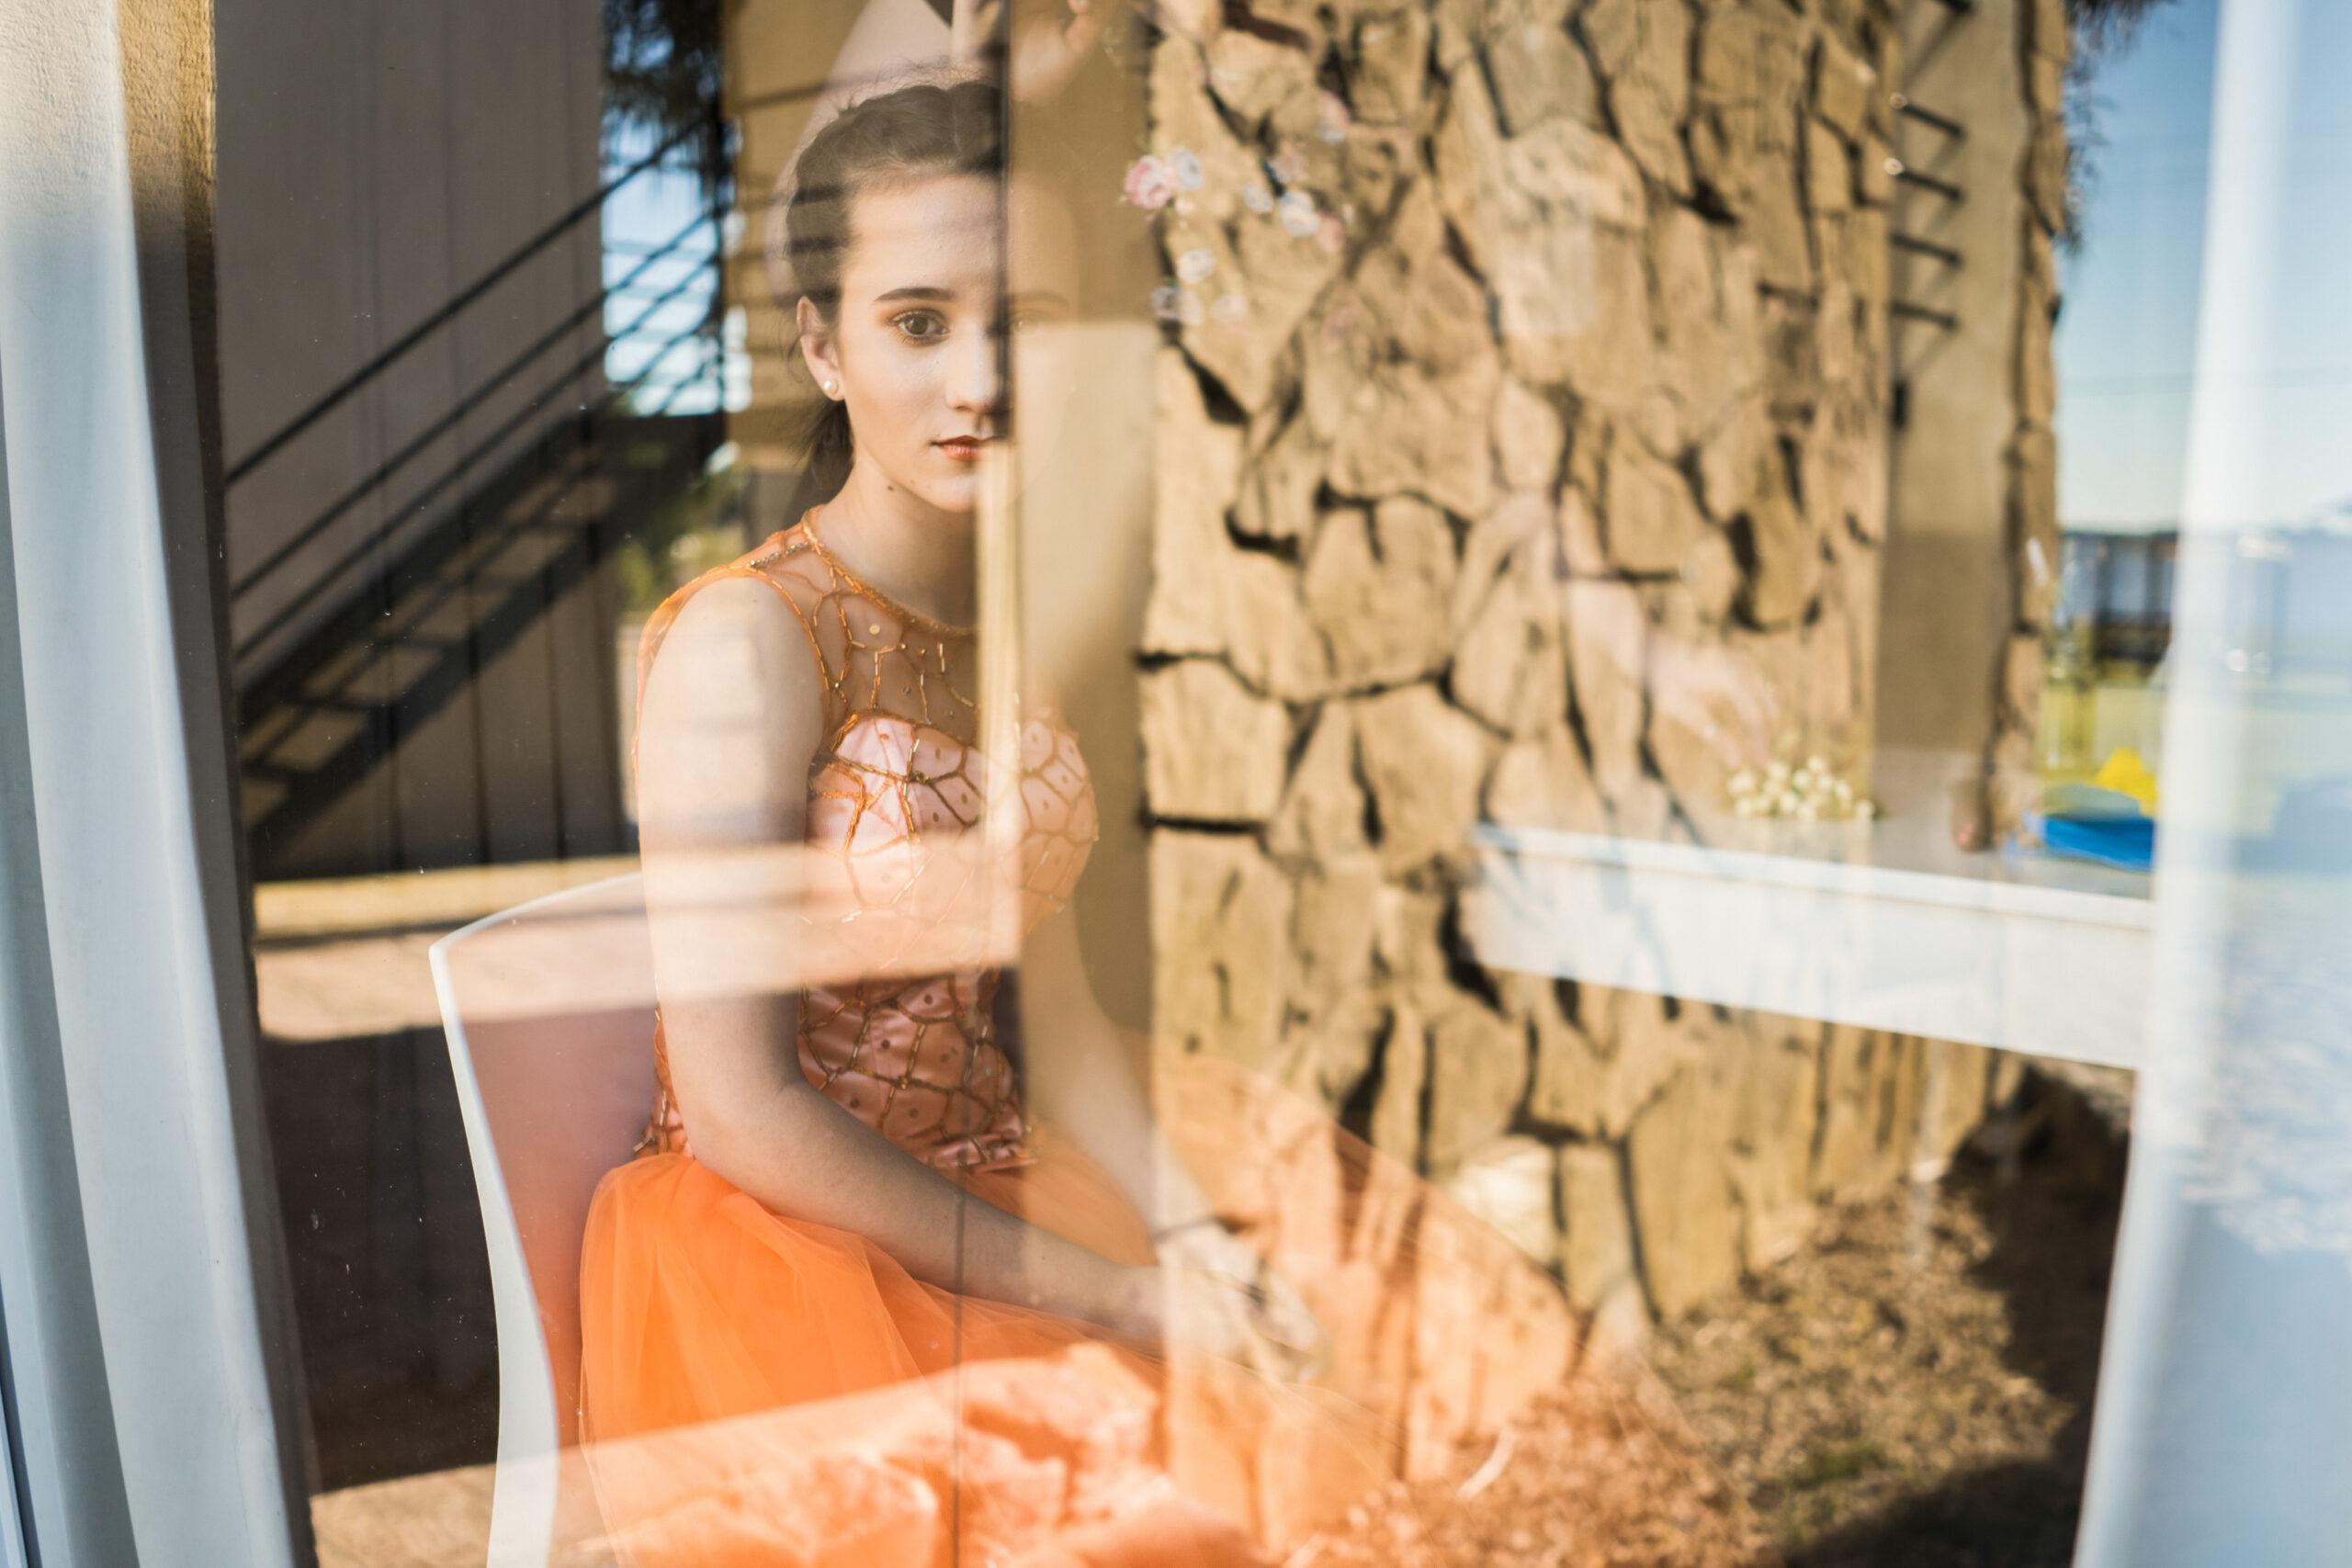 sesion de quince años xv exteriores fp films photo